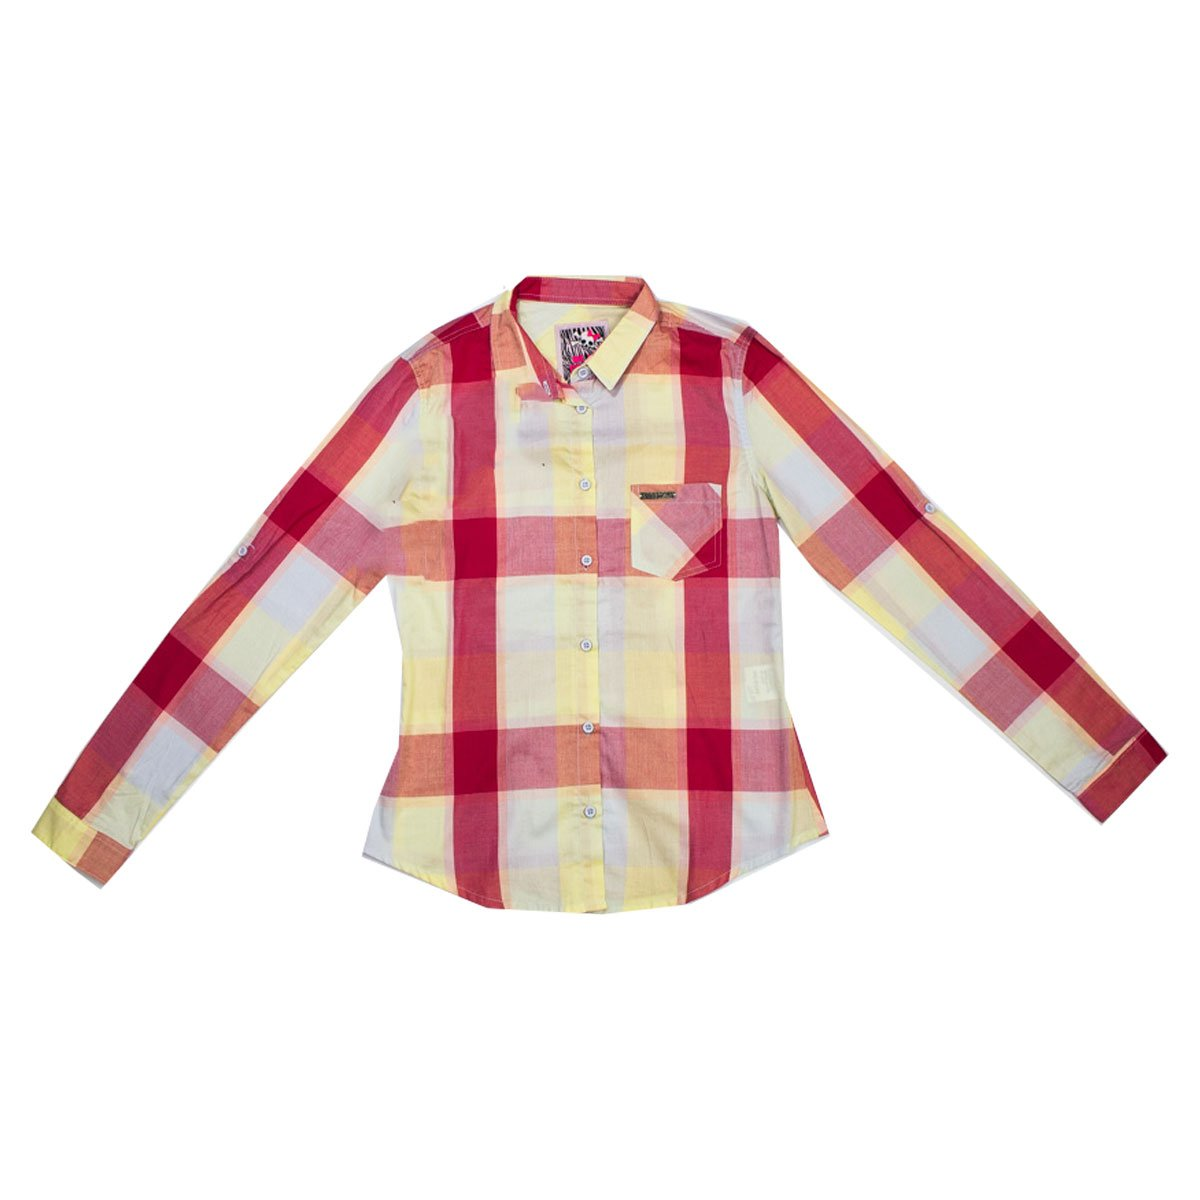 e70e4299b Bizz Store - Camisa Xadrez Infantil Menina Colcci Fun Rosa